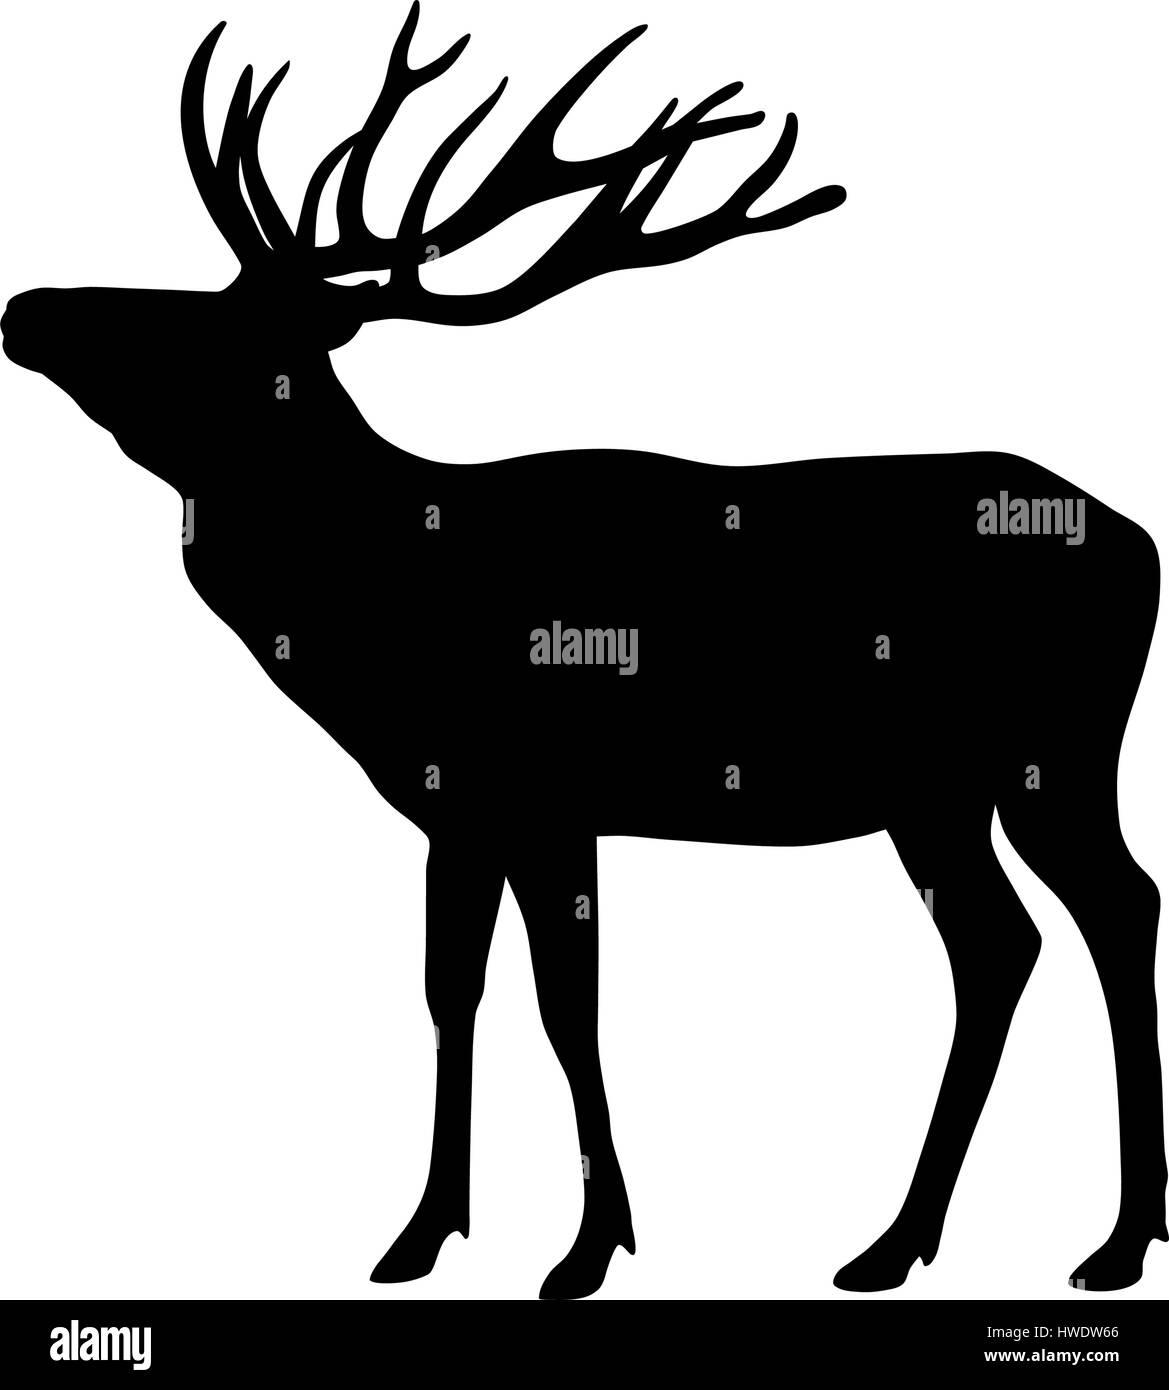 Vector illustration of deer silhouette Photo Stock